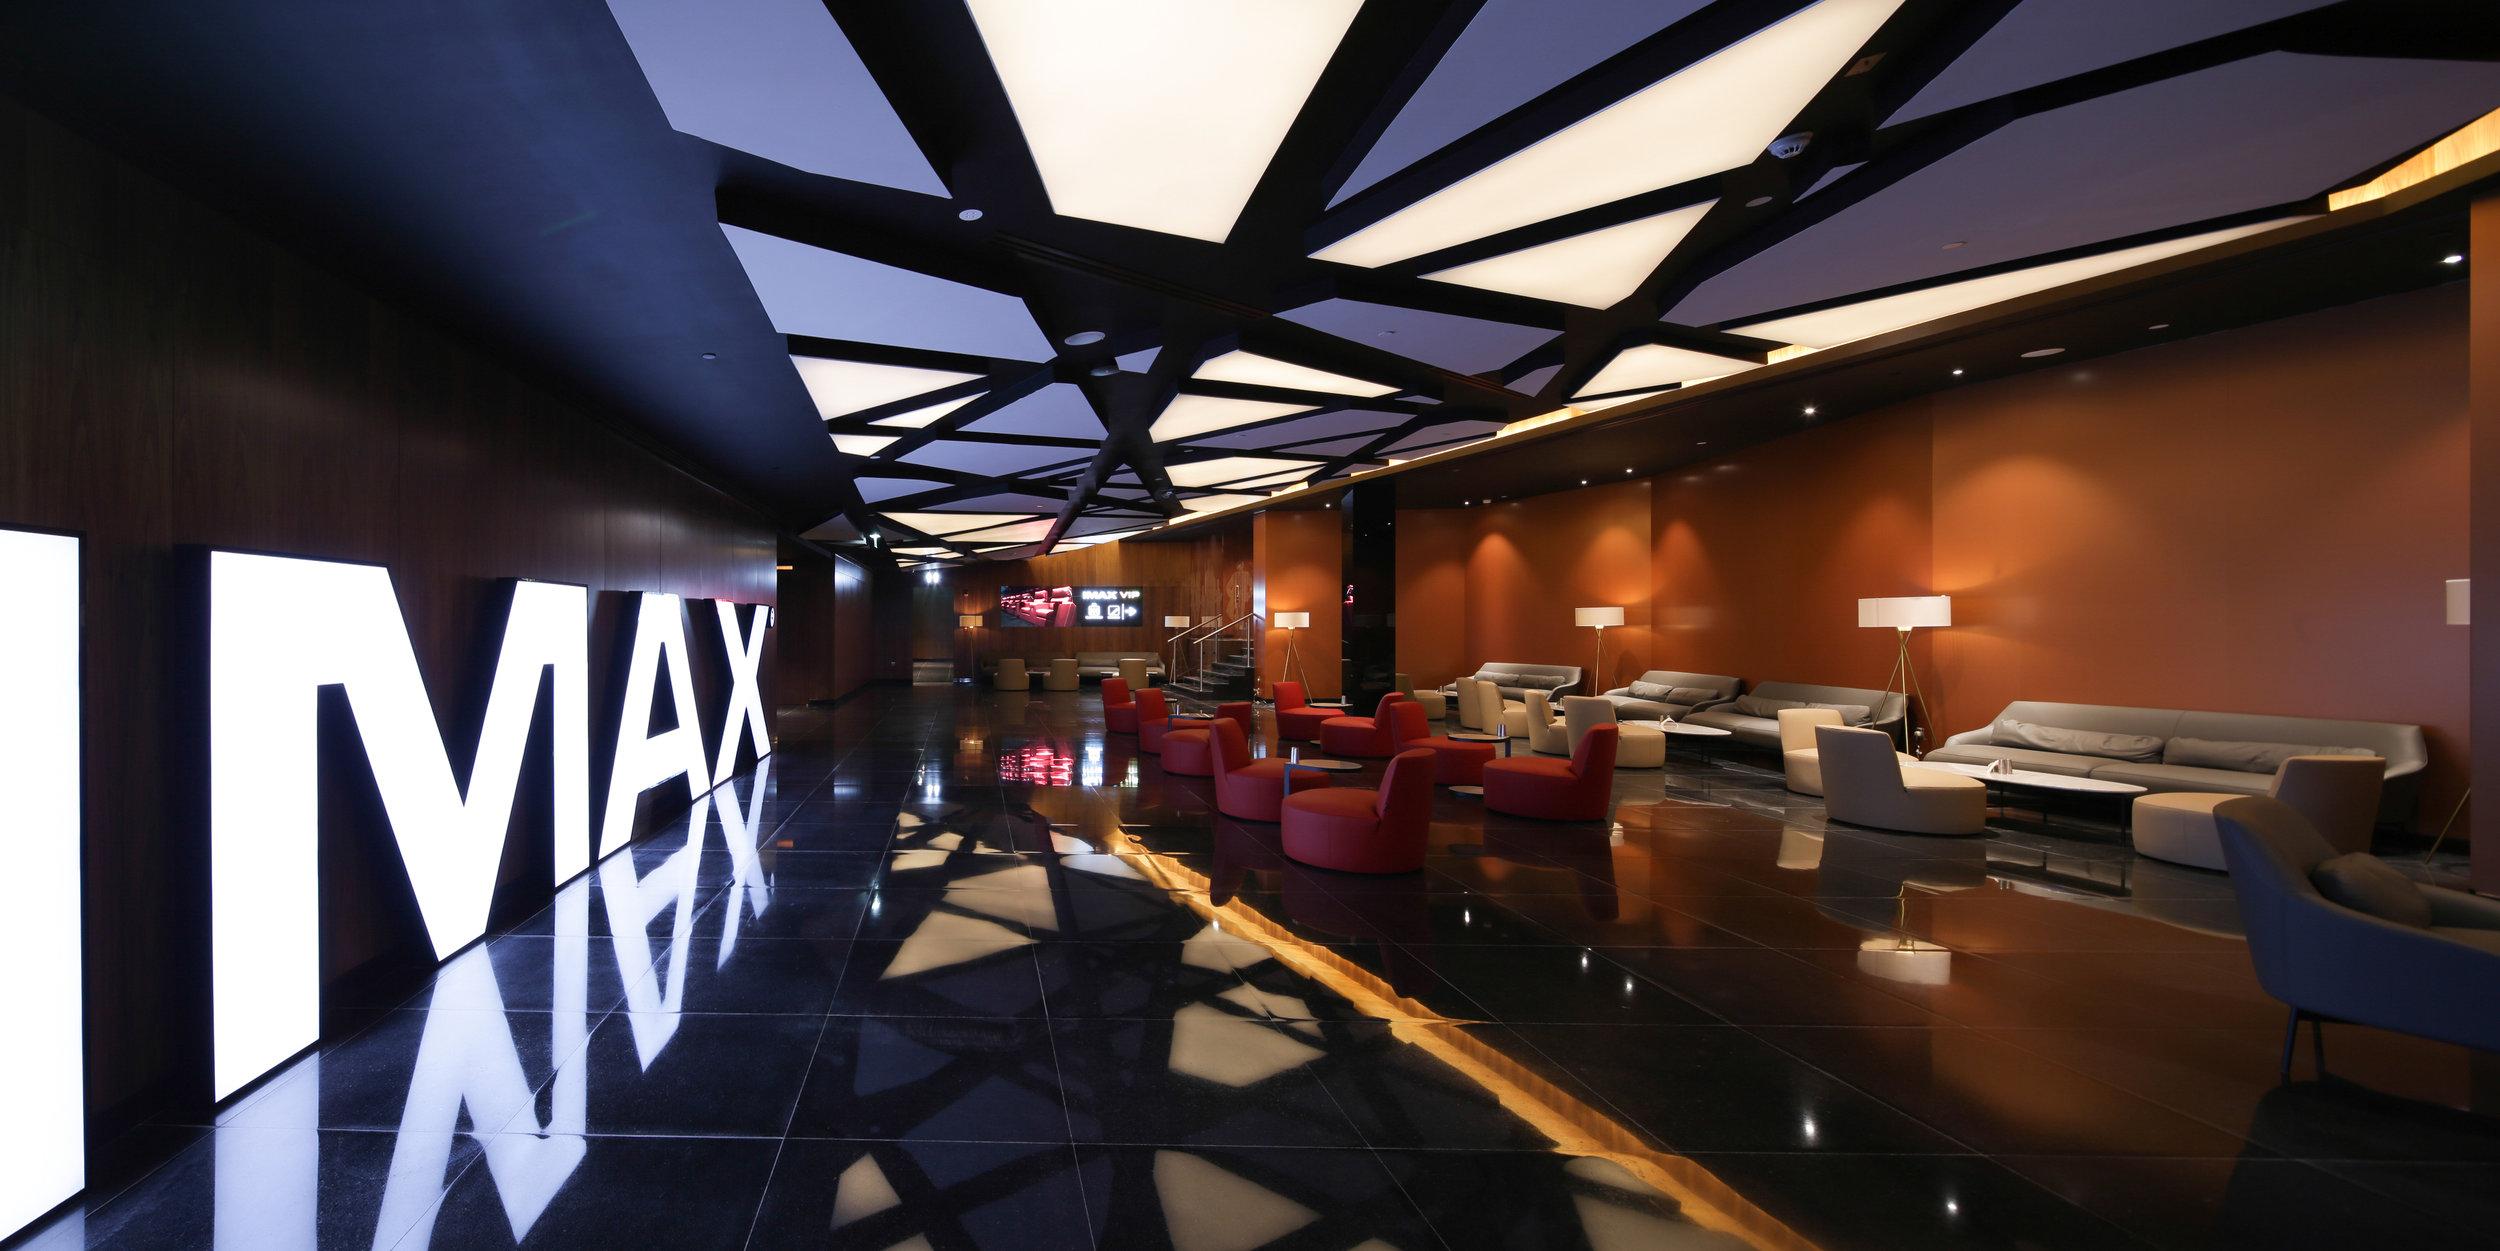 IMAX Lounge, Cinemacity IMAX